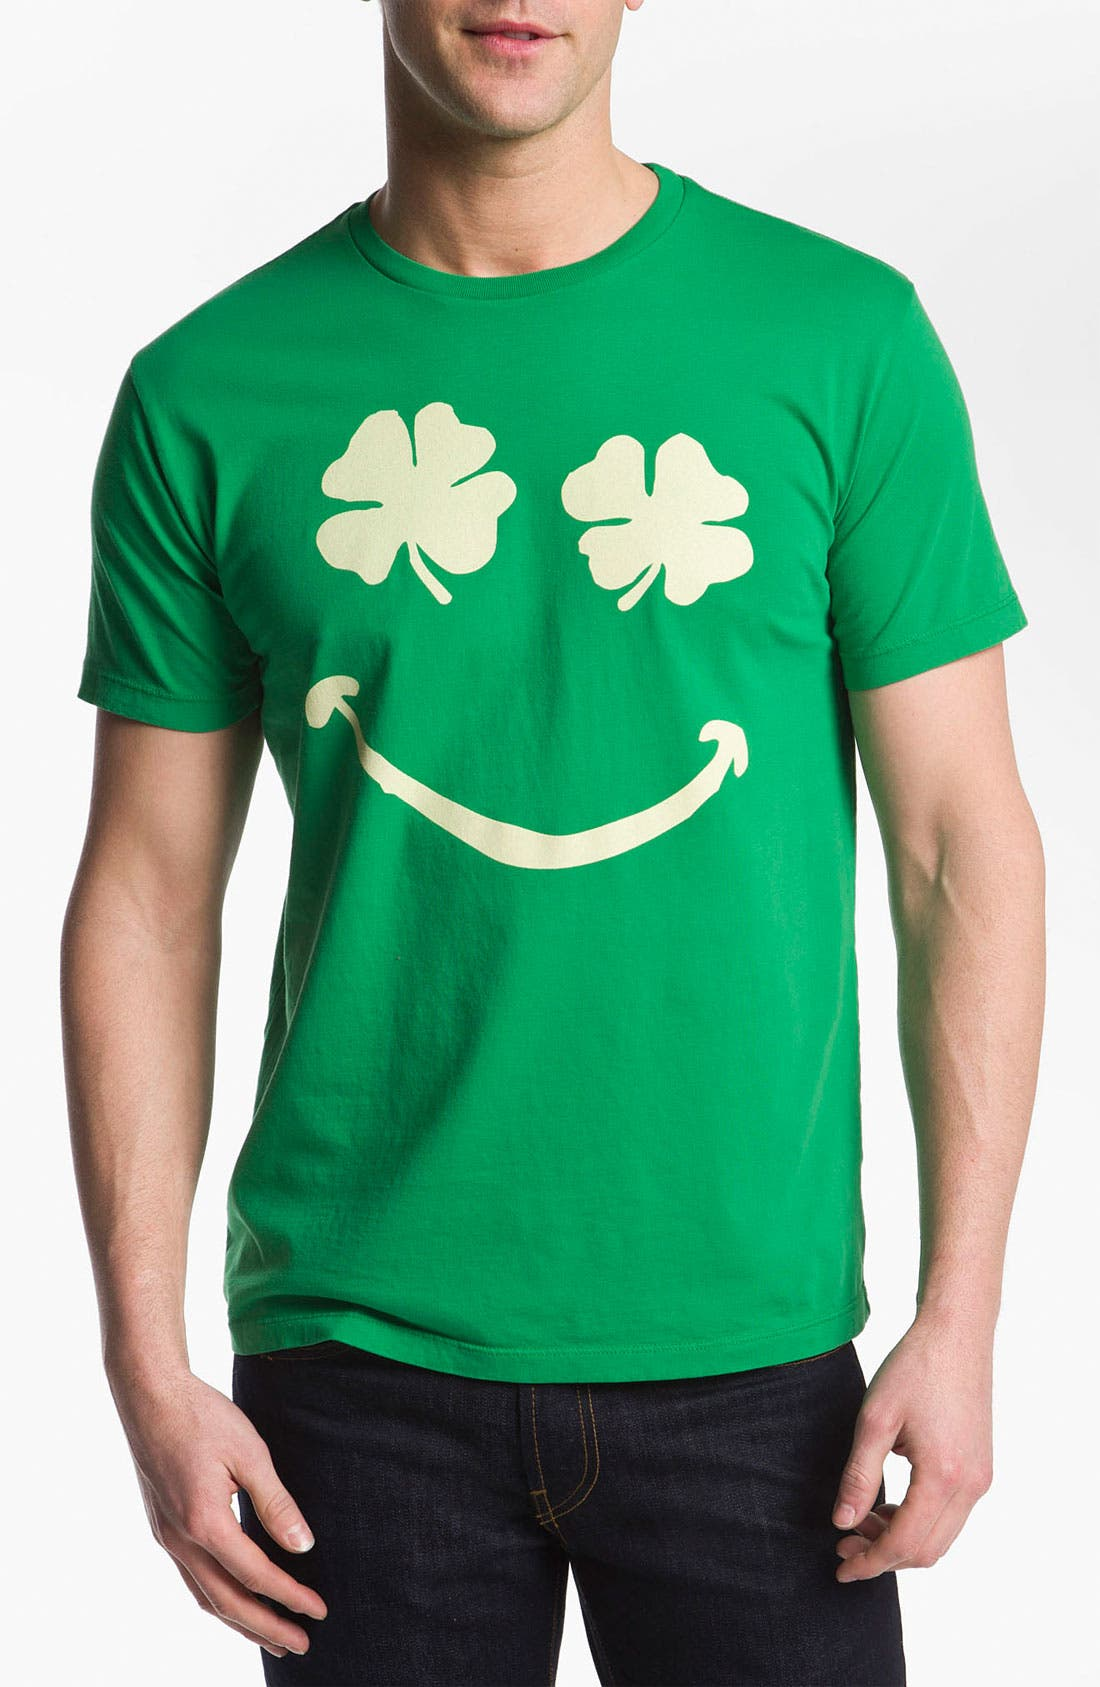 Alternate Image 1 Selected - Tankfarm 'Irish Eyes' T-Shirt